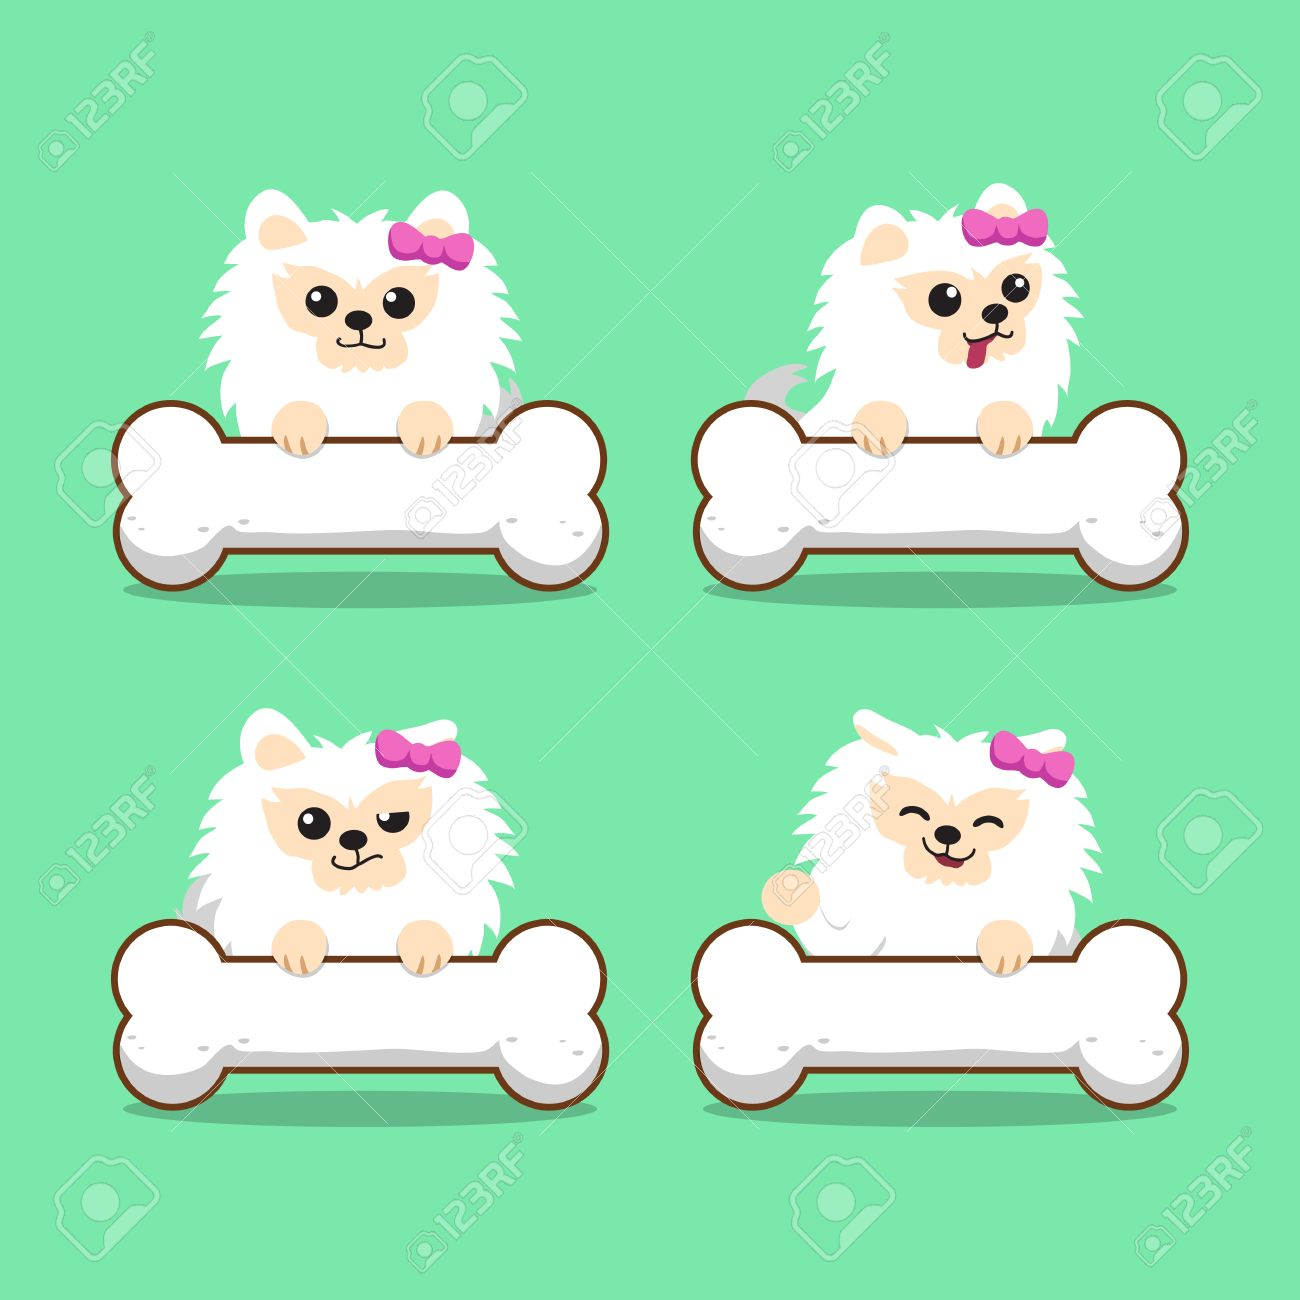 Cartoon Character White Pomeranian Dog With Big Bones Royalty Free Cliparts Vectors And Stock Illustration Image 63016606